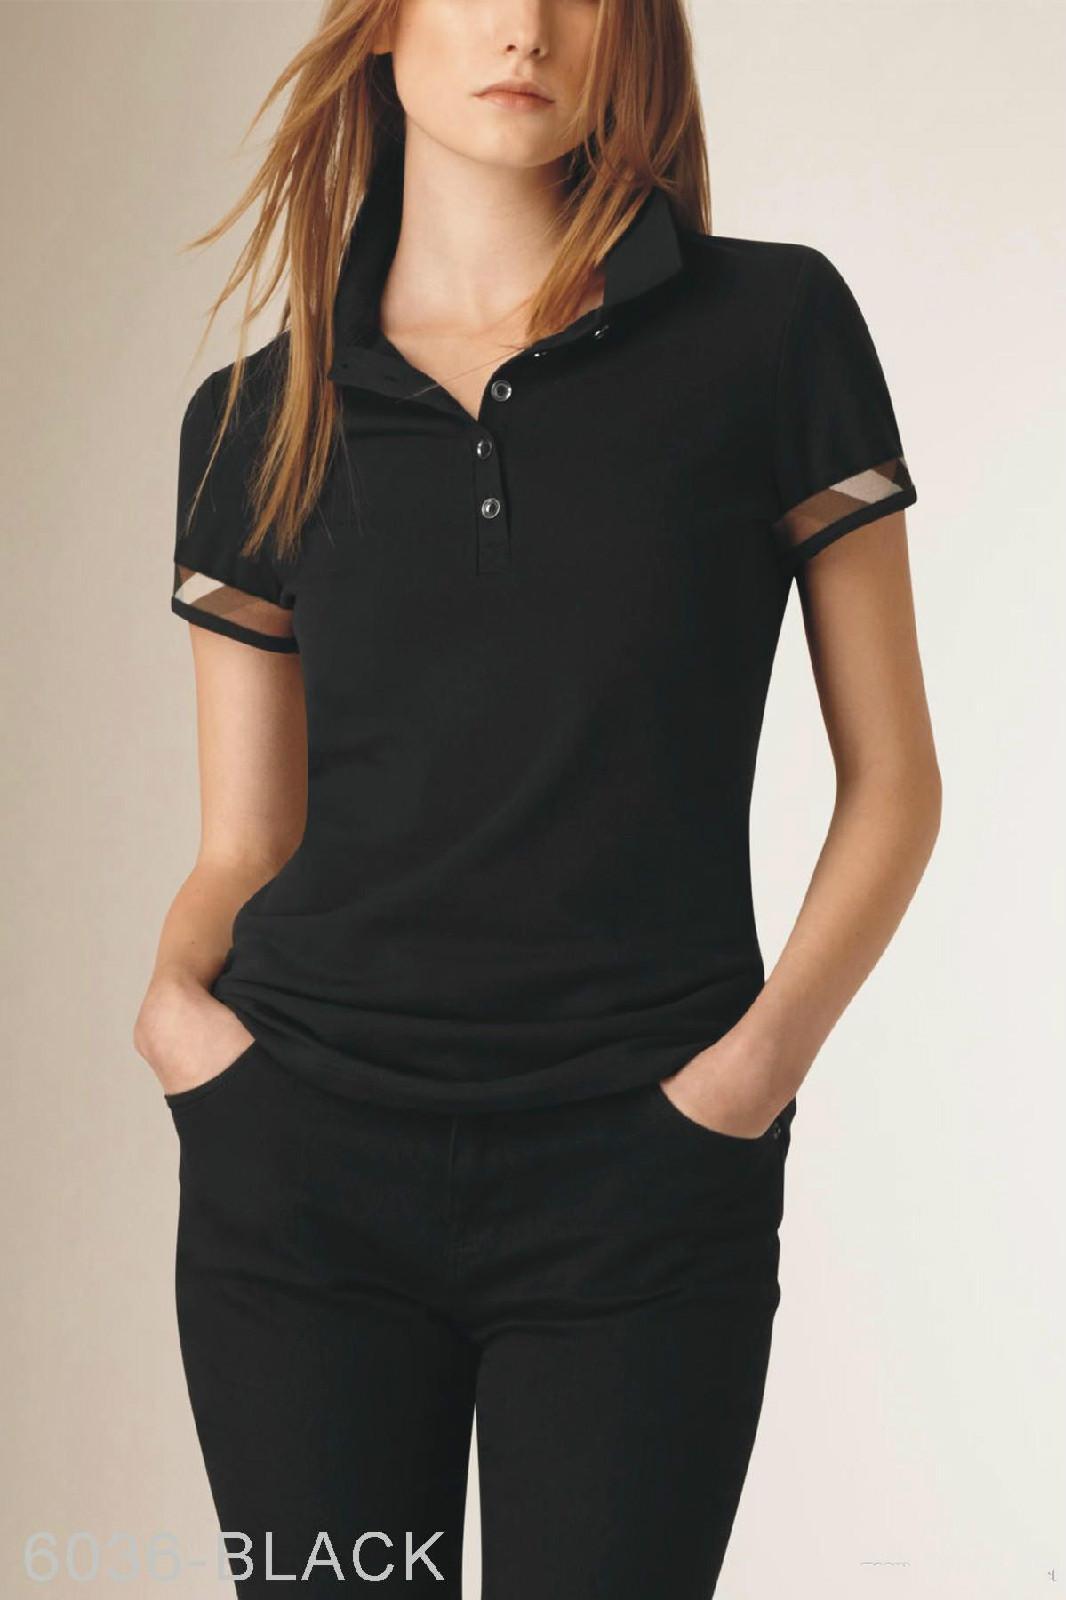 2018 Brand Summer Tops Women Polo Shirt Cotton Soild Short Sleeve Couple  Tops Slim Tee Shirt Breathable Polo Shirt Women S Polos S XXL UK 2019 From  Heyjuly 65cec5ad5d